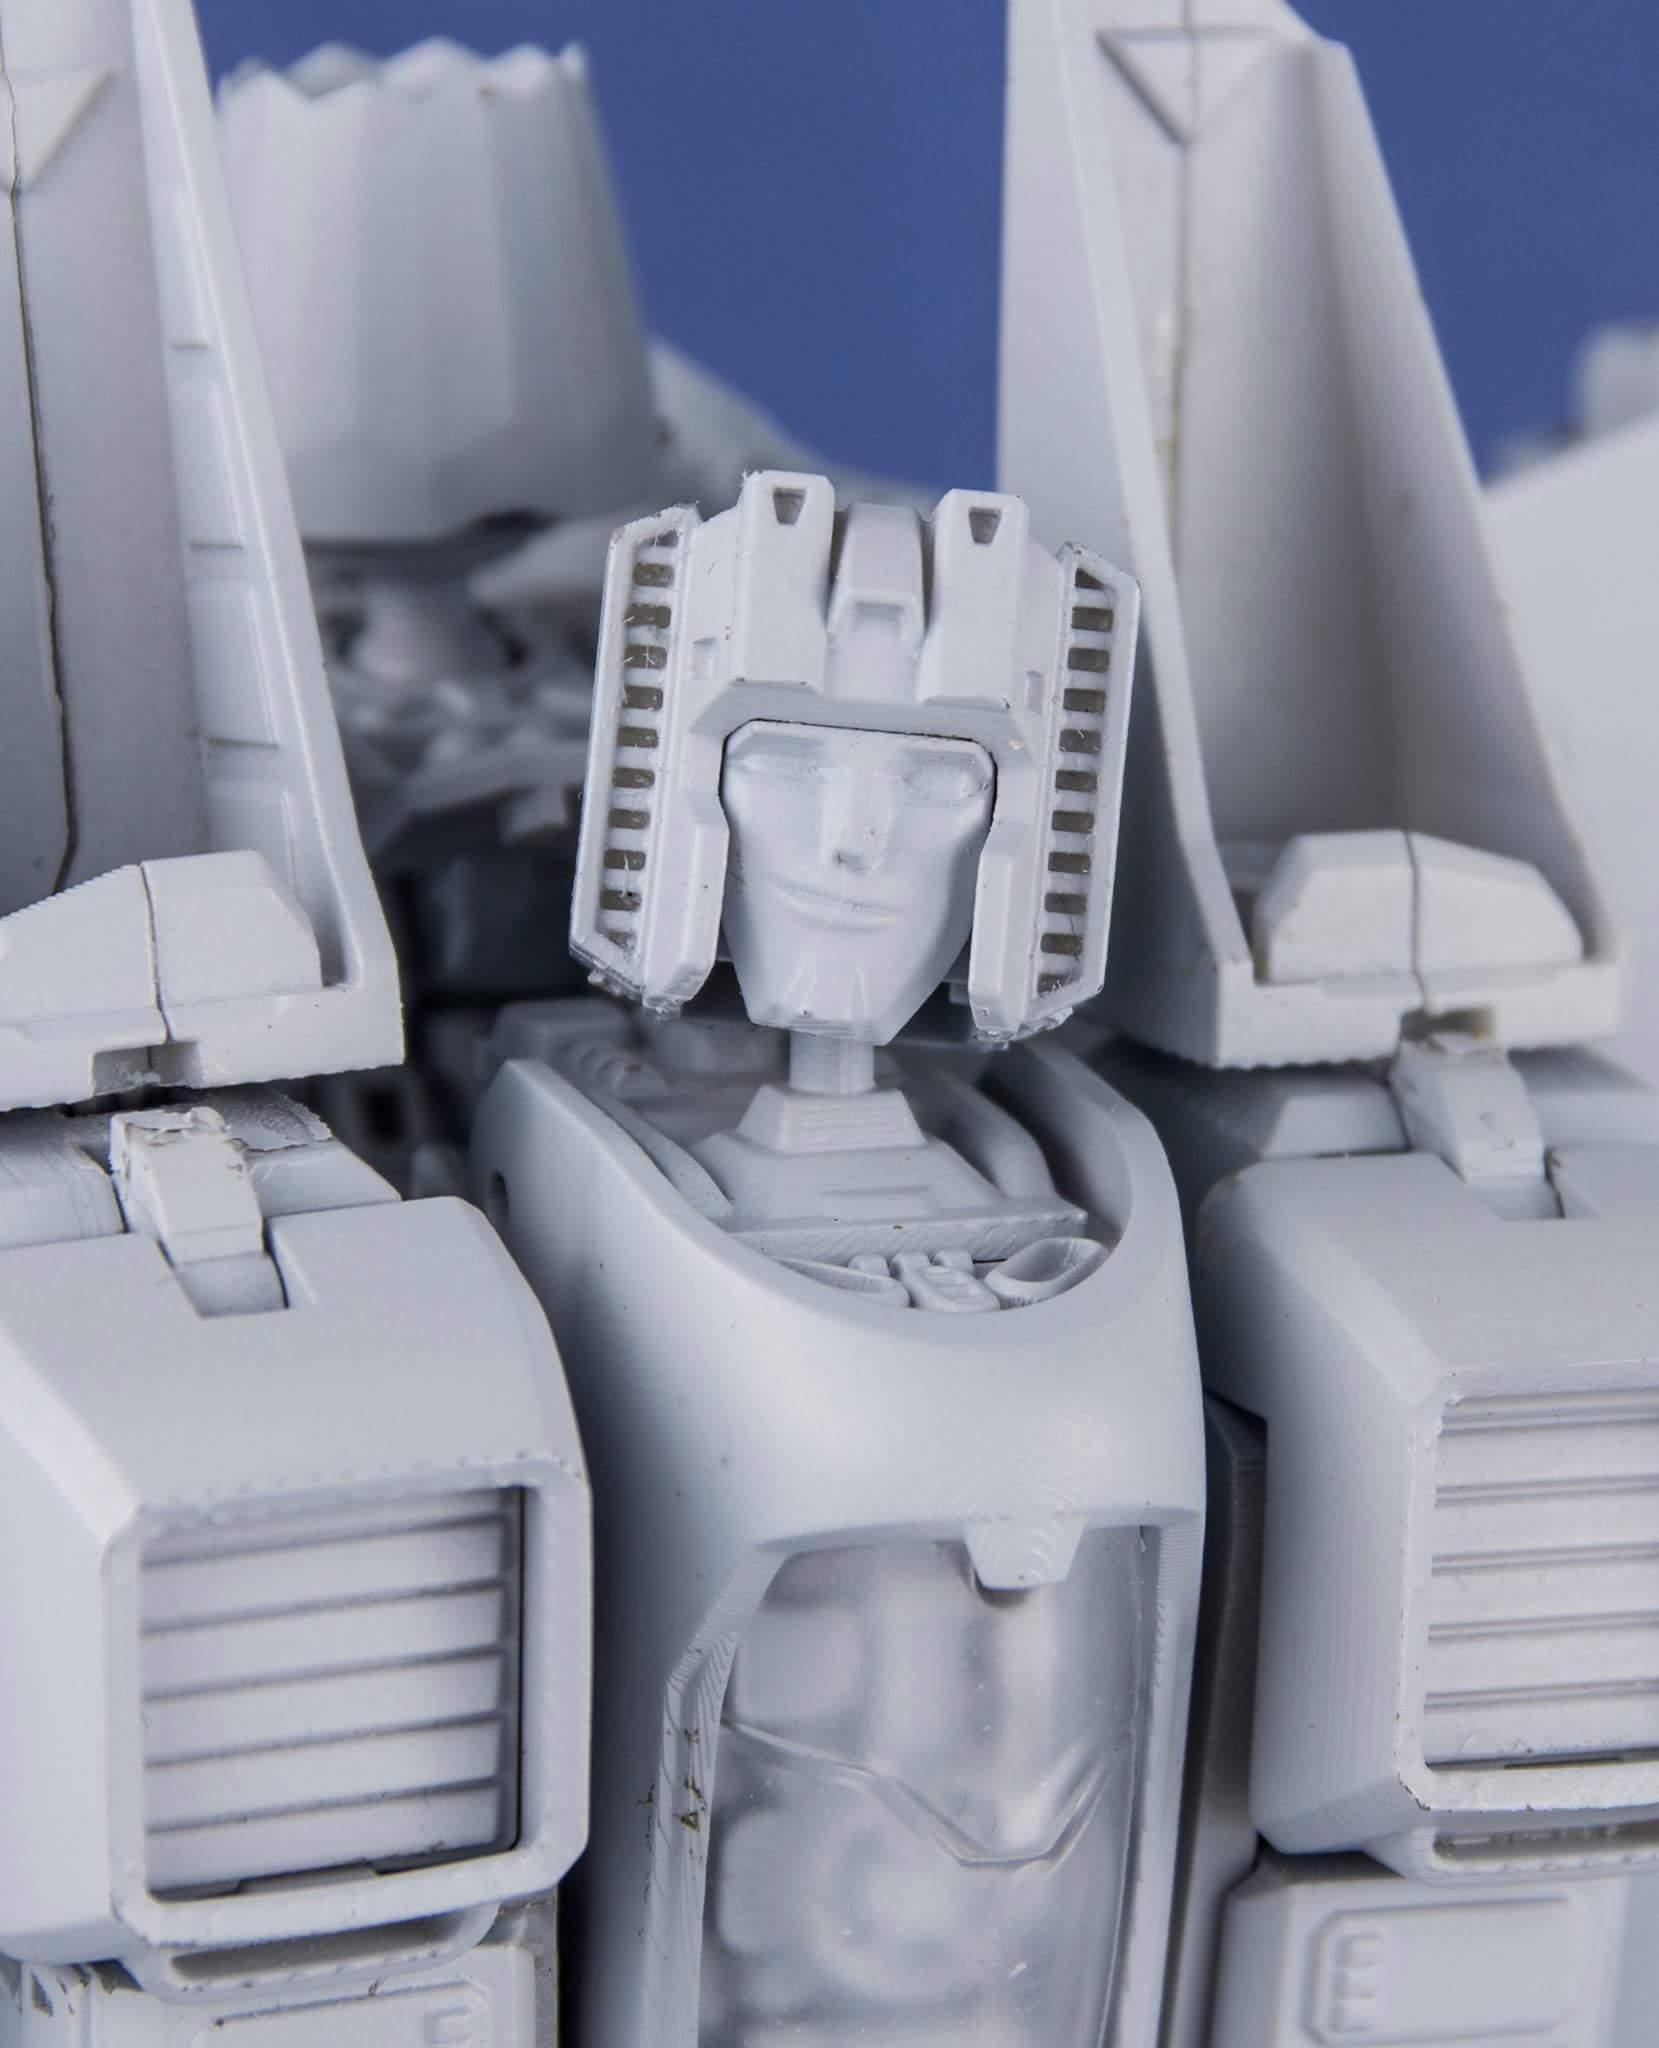 [MAAS Toys] Produit Tiers - Jouets TF de la gamme Cybertech Series (mode Cybertronien) + Gee Too (G2) - Page 2 TszVvQUt_o